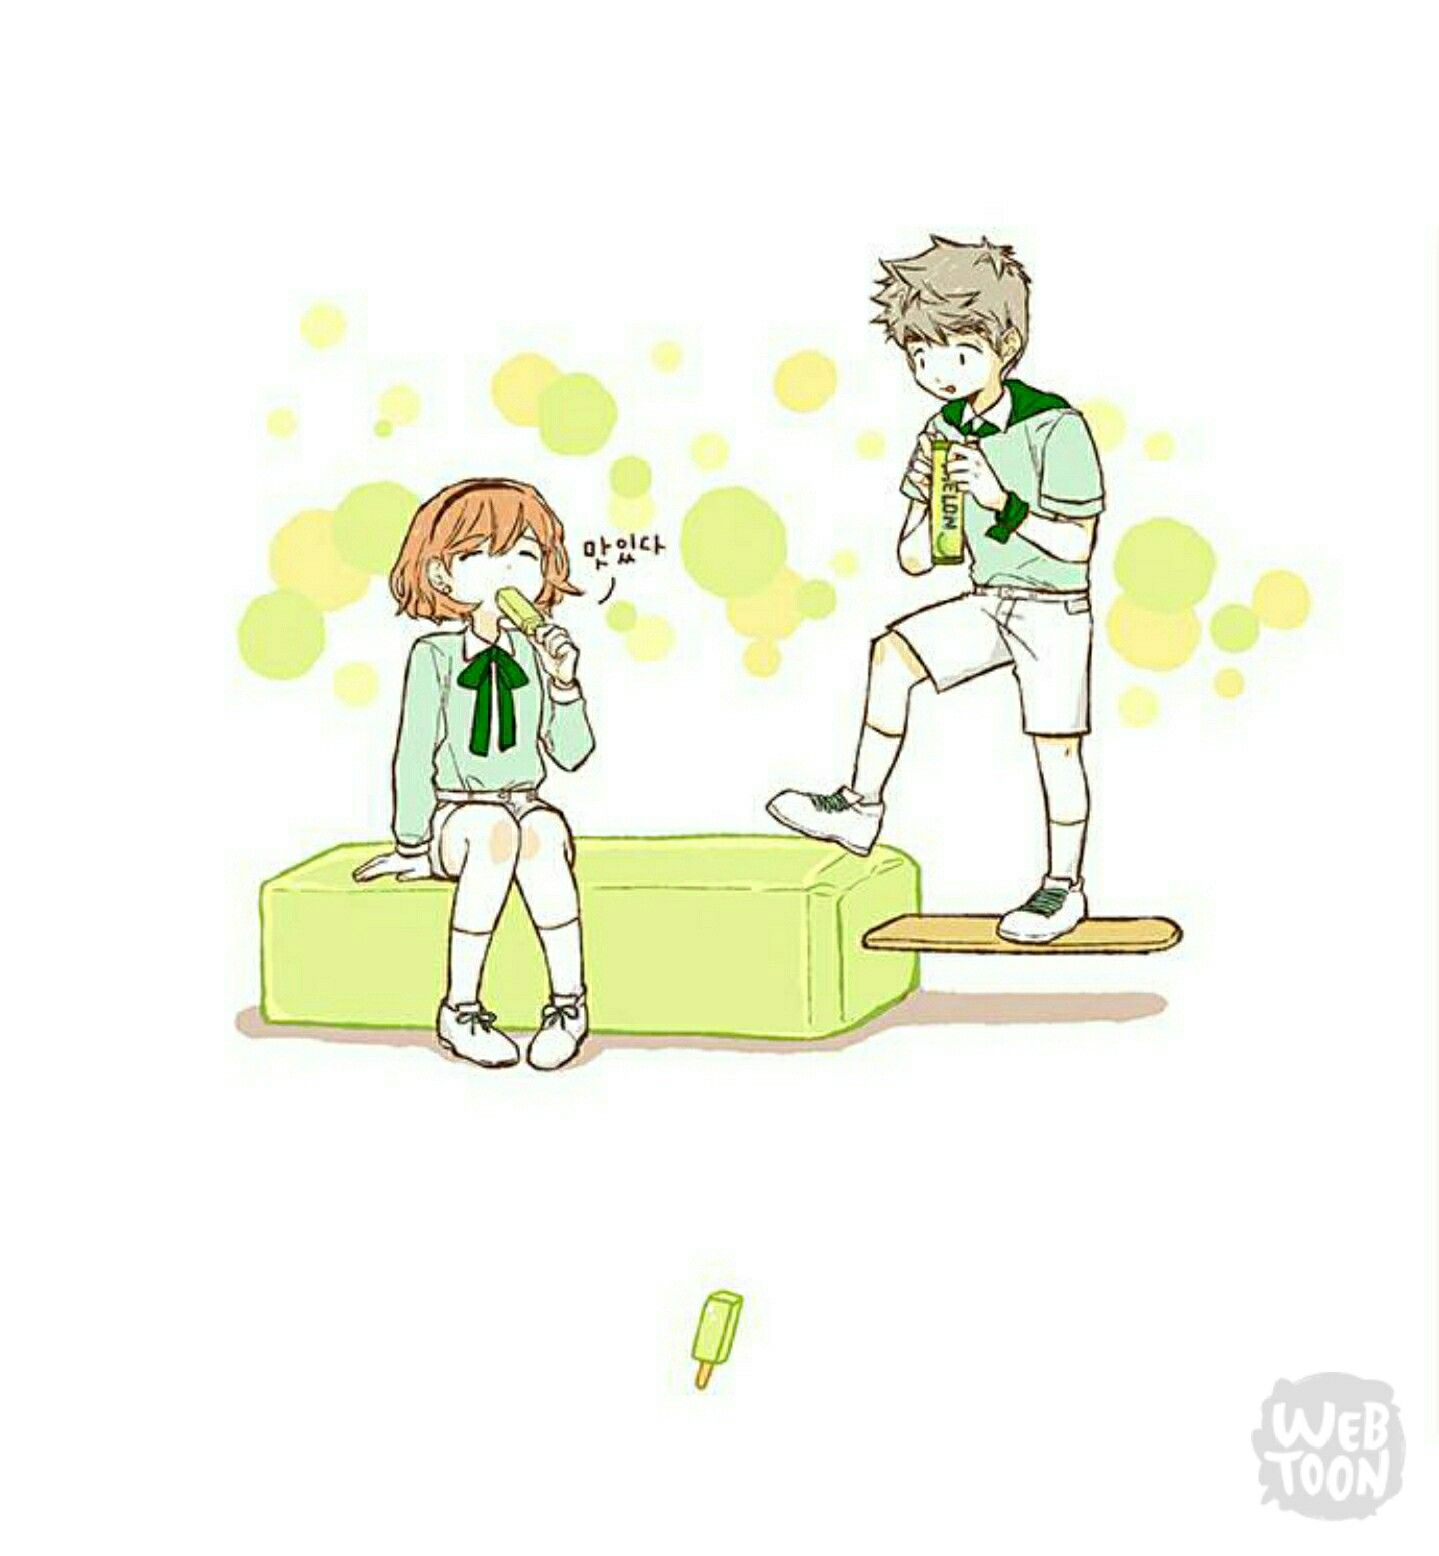 Naver webtoon 101 super secret webtoons pinterest naver webtoon 101 super secret stopboris Images